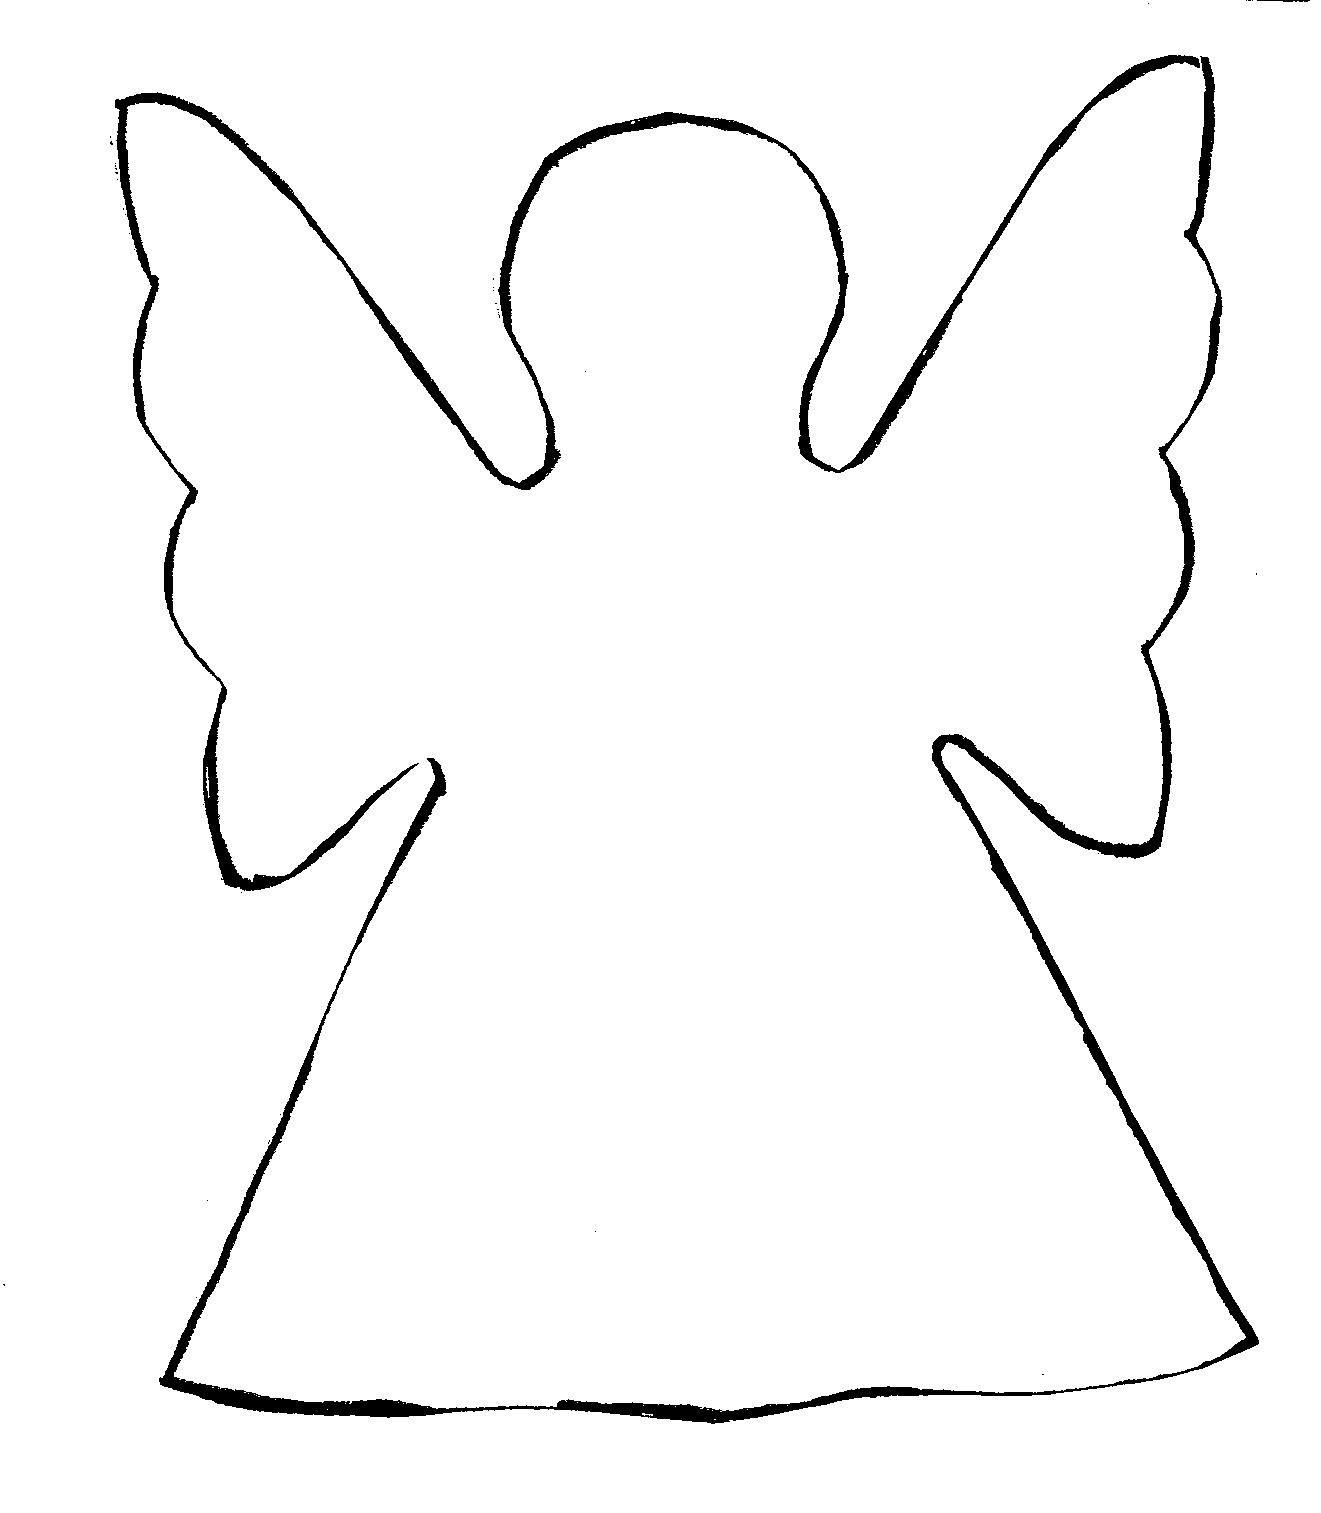 6a00e55004a7cb8834010536553975970c Pi 1 321 1 513 Pixels Christmas Angels Christmas Templates Angel Crafts